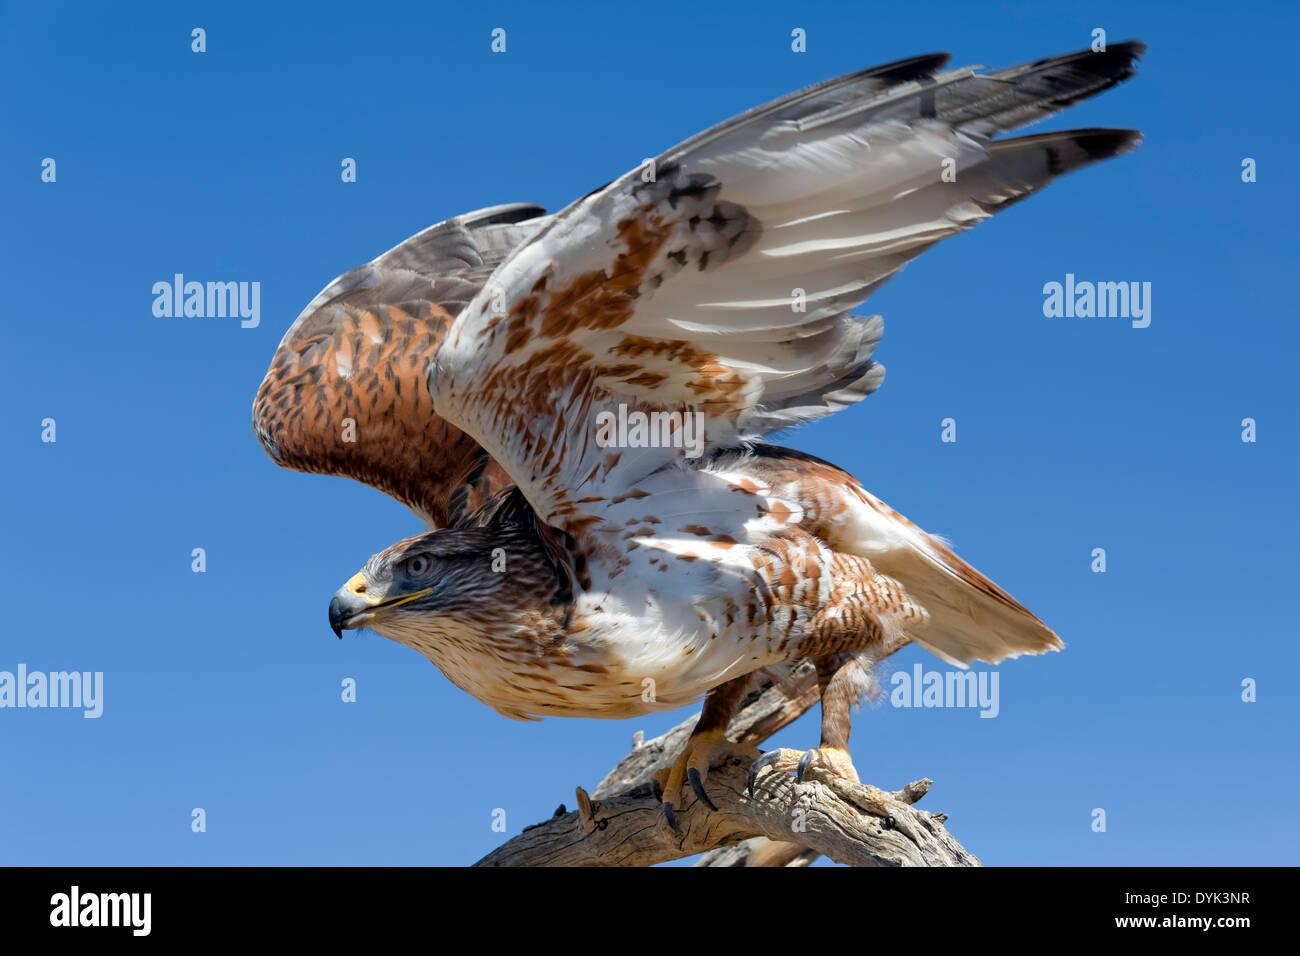 Ferruginous Hawk (Buteo regalis) - Stock Image